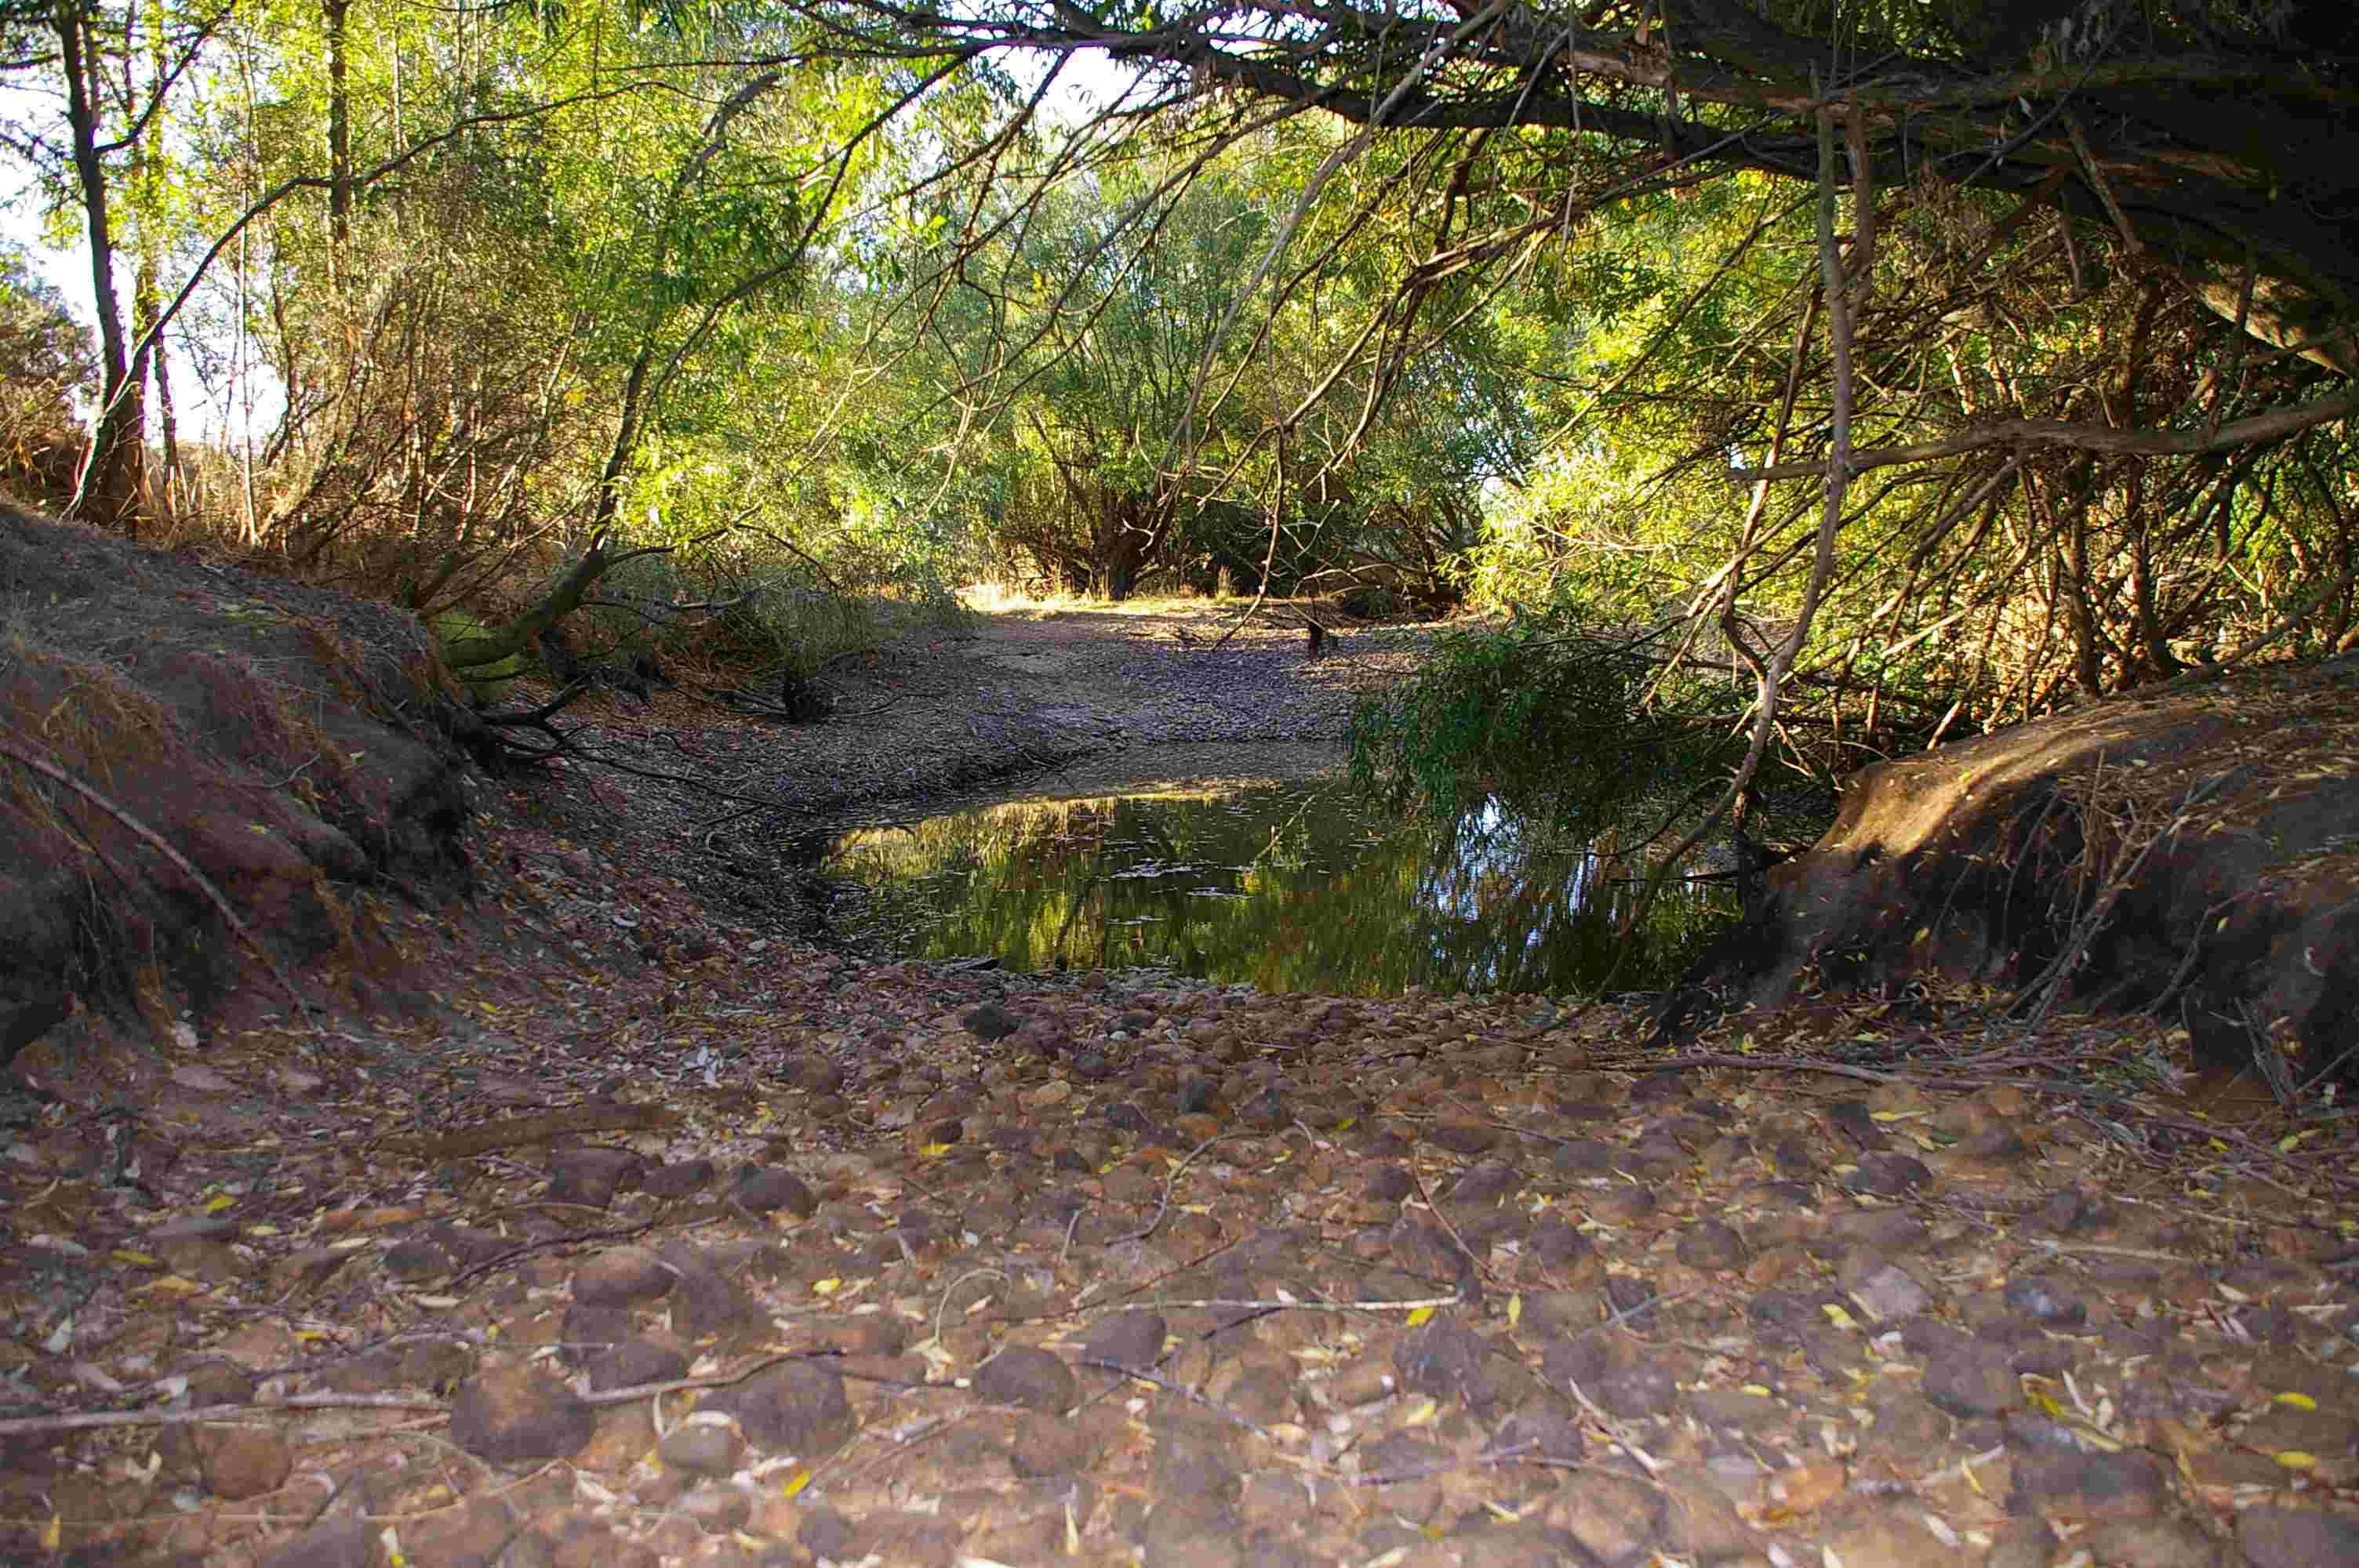 Amazing Loddon River Bed